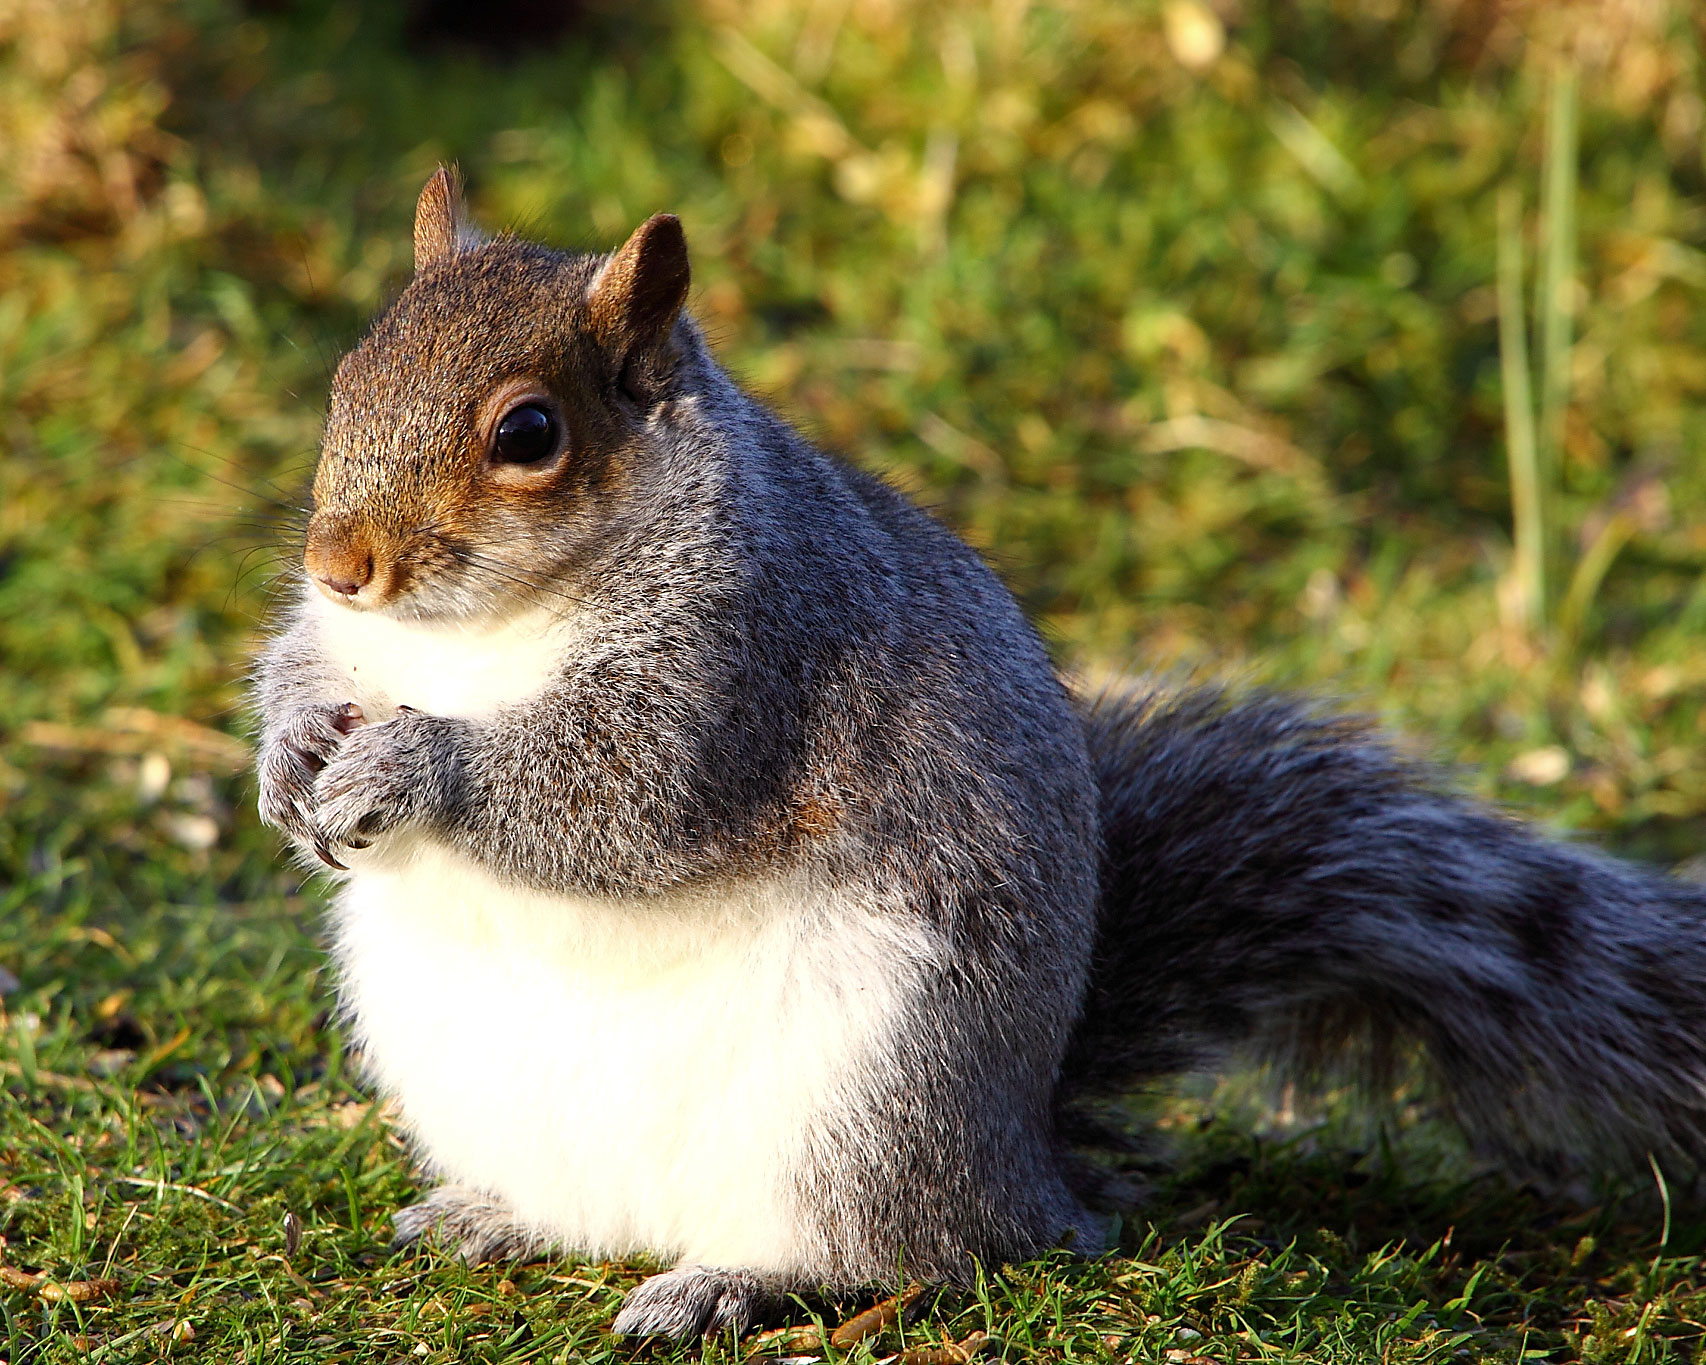 High Resolution Wallpaper | Squirrel 1706x1365 px